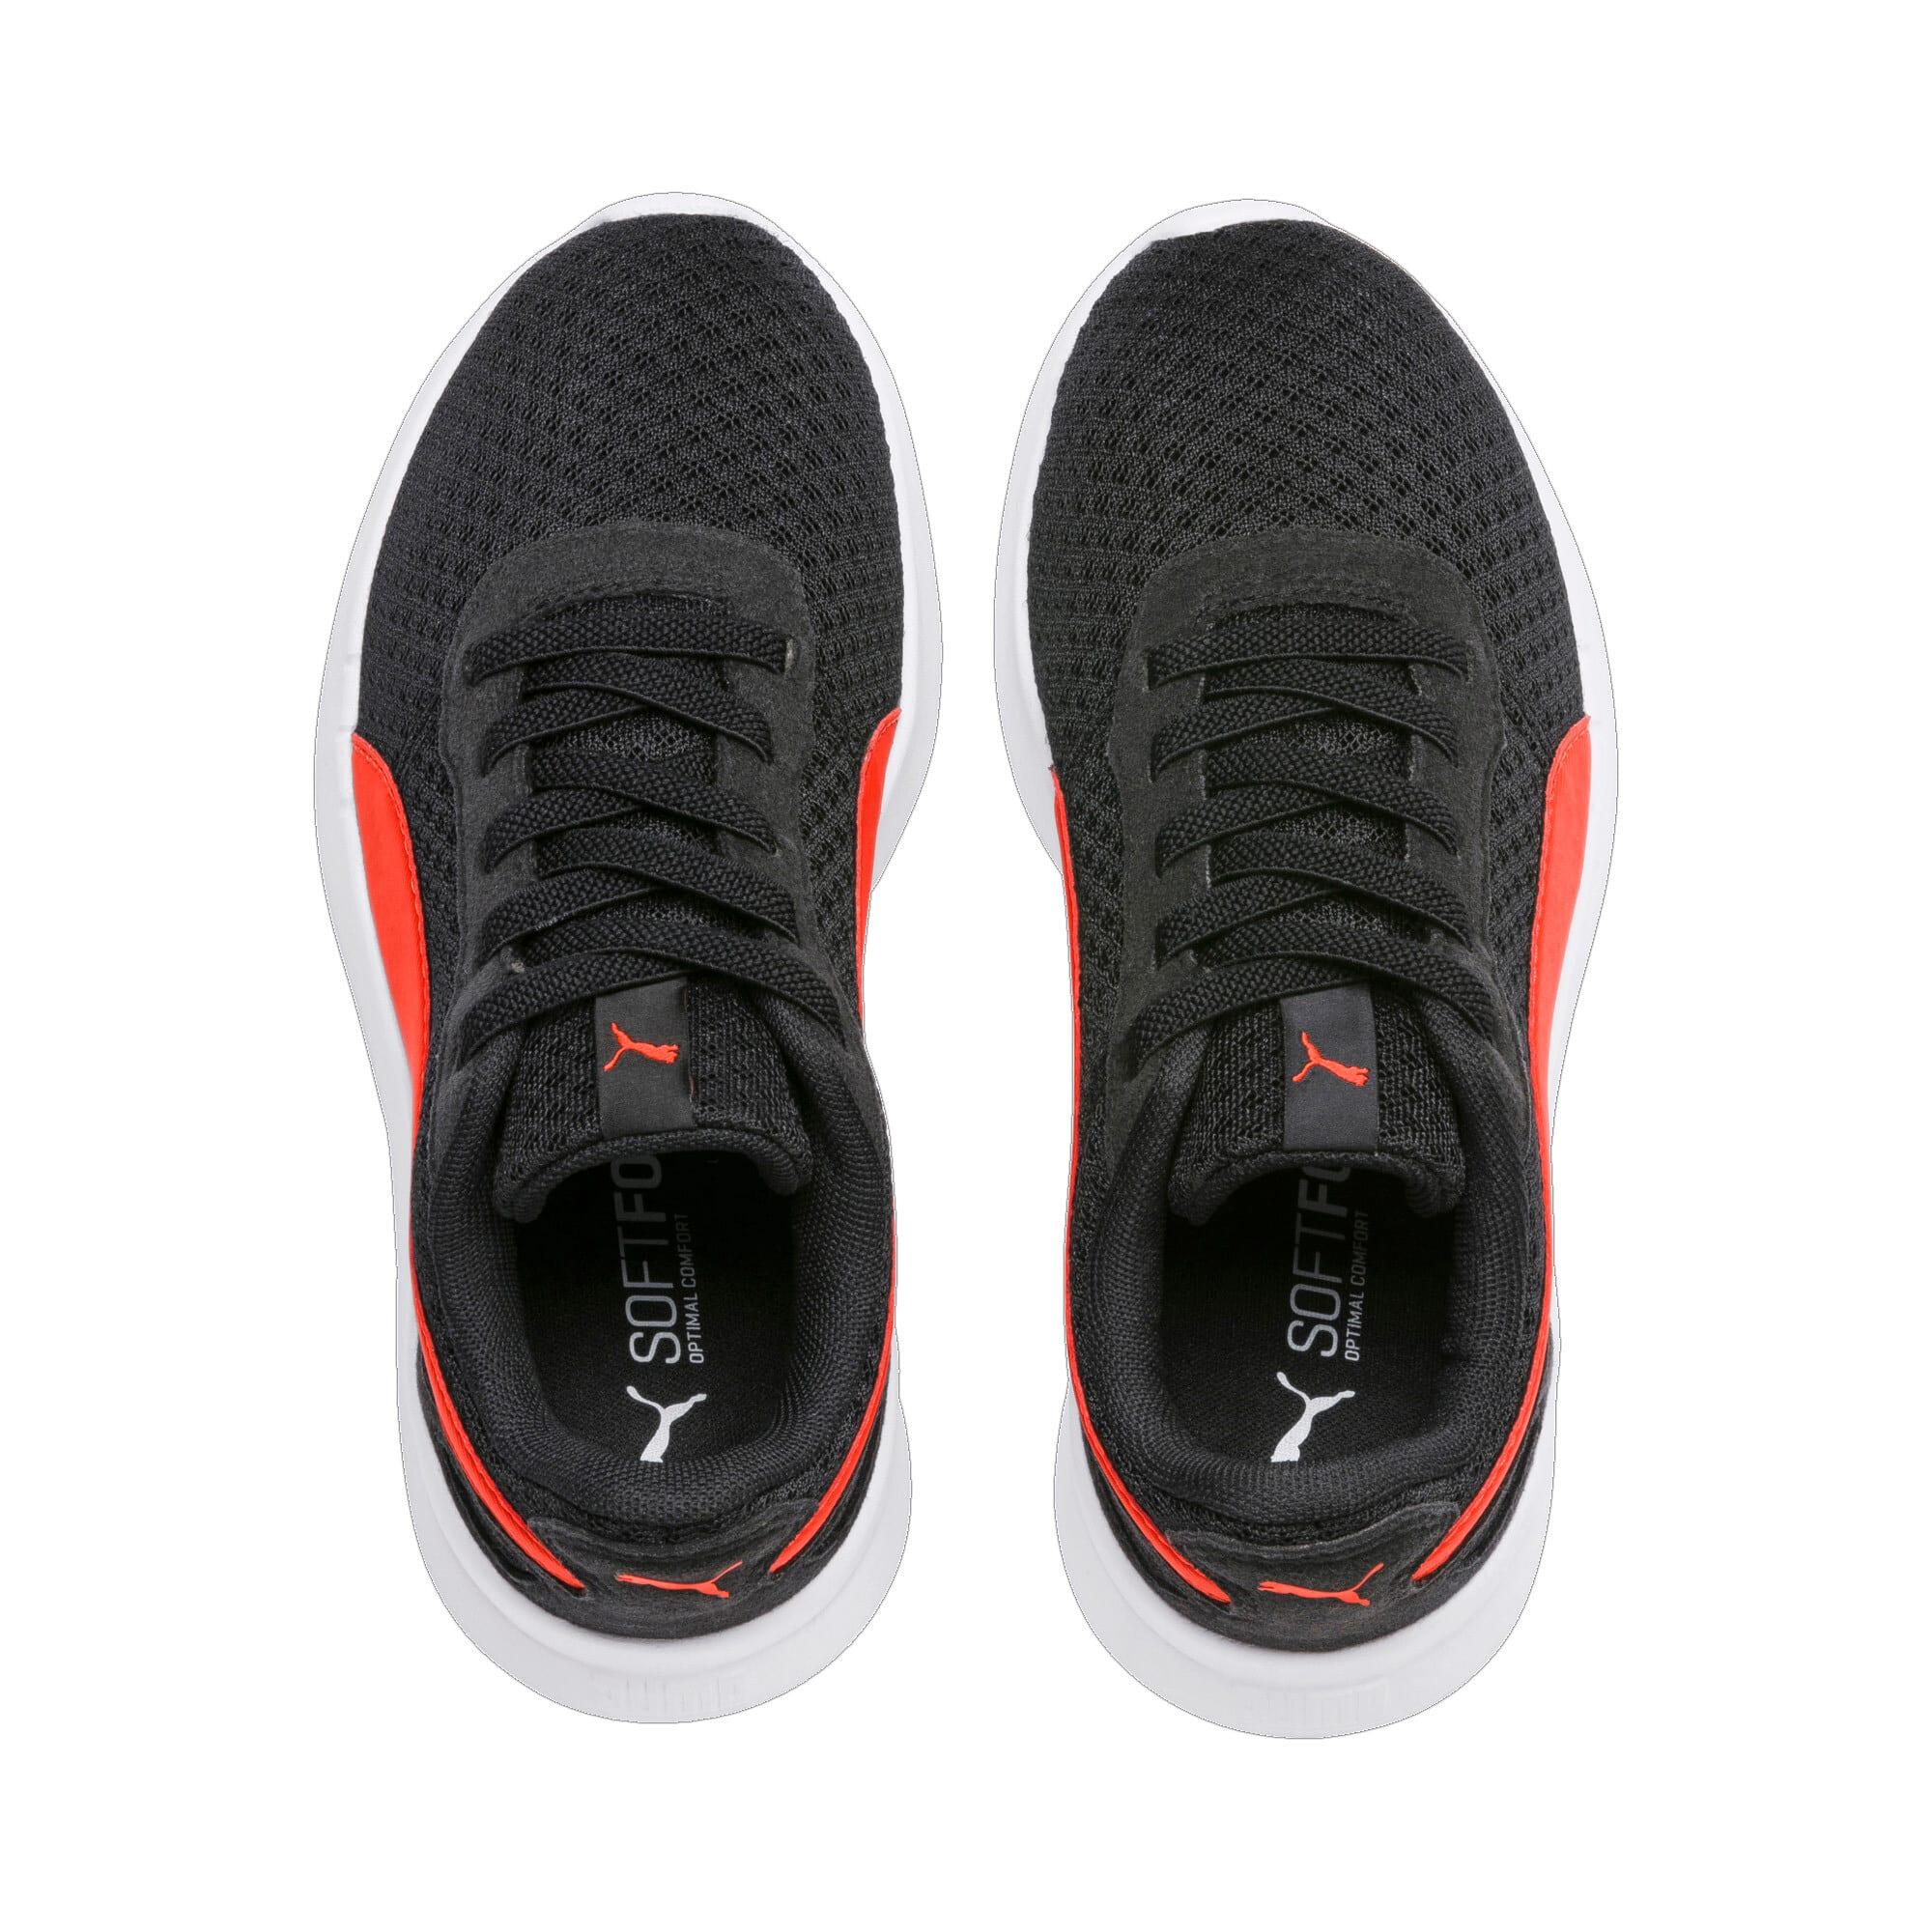 Thumbnail 6 of ST Activate Sneakers PS, Puma Black-Cherry Tomato, medium